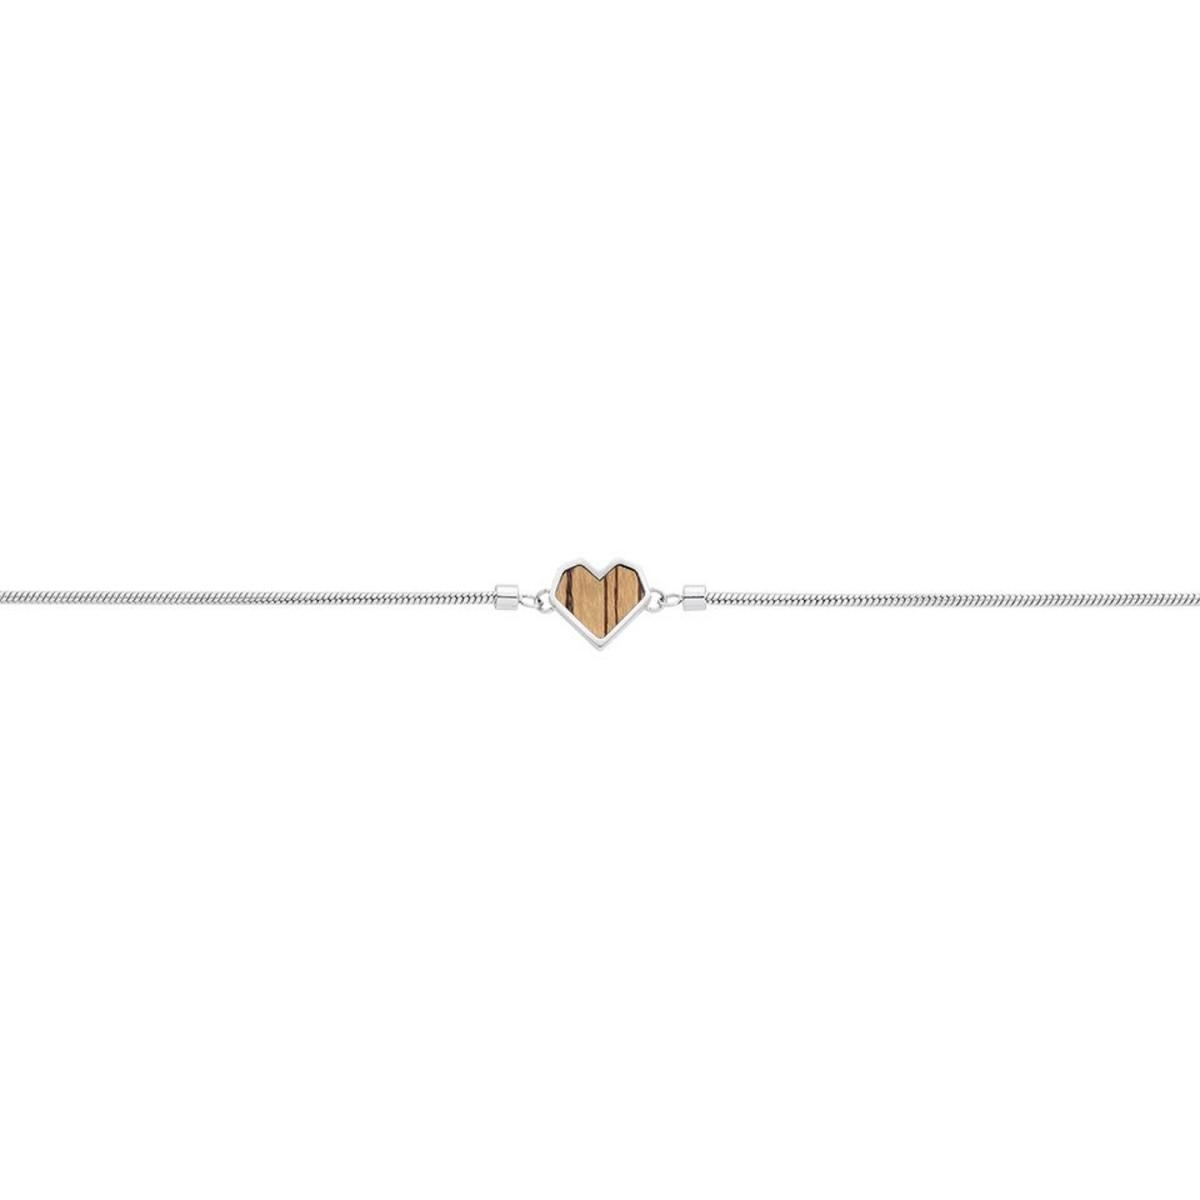 "Armband mit Holzdetail - Motiv Herz - ""Lini Bracelet Heart"""